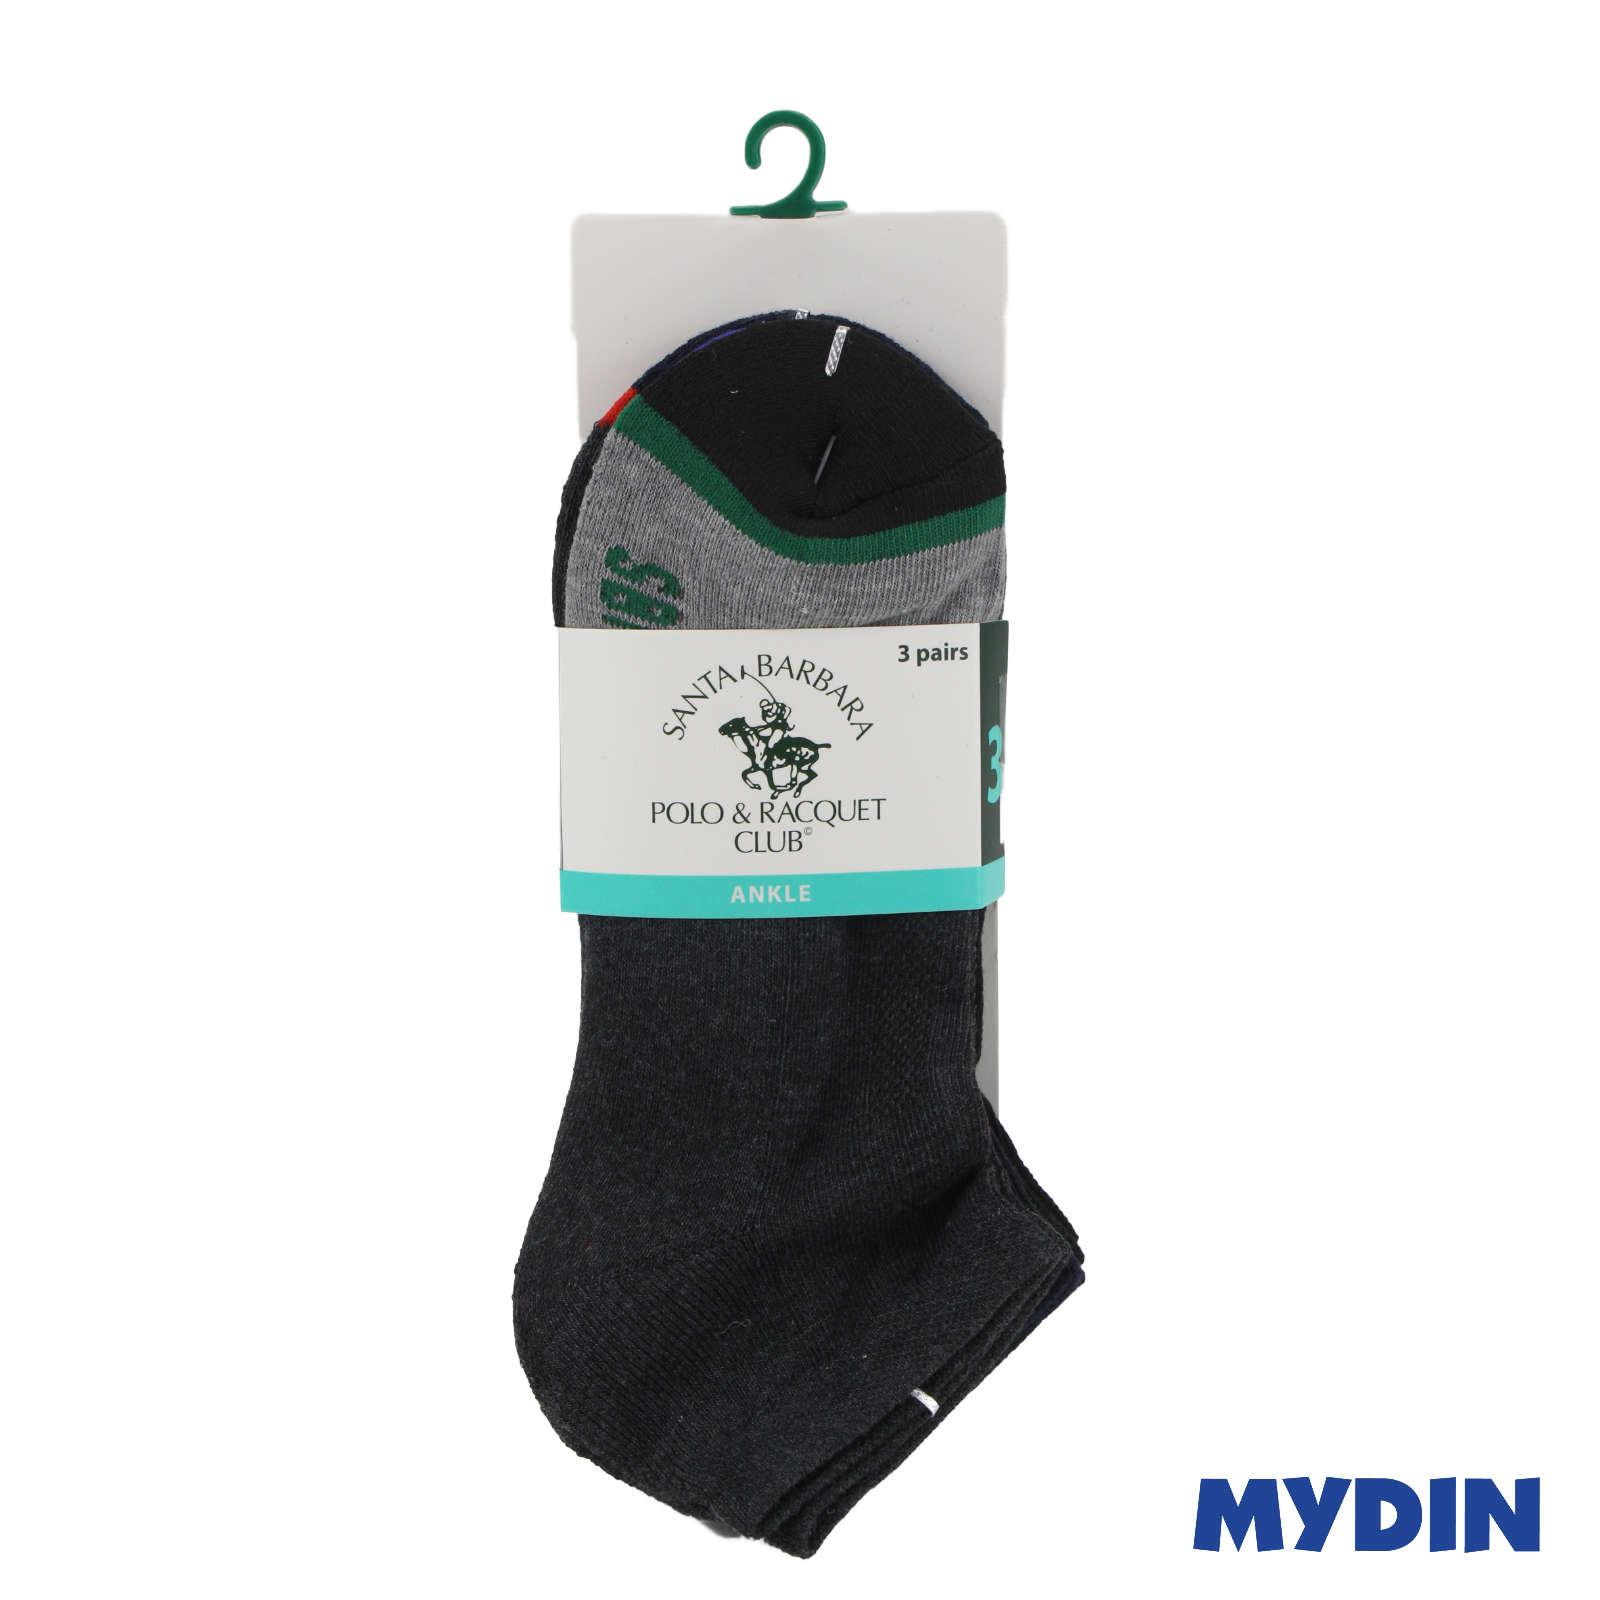 Santa Barbara Polo & Racquet Club Men Socks SBB2002-3 (3s) - Ankle